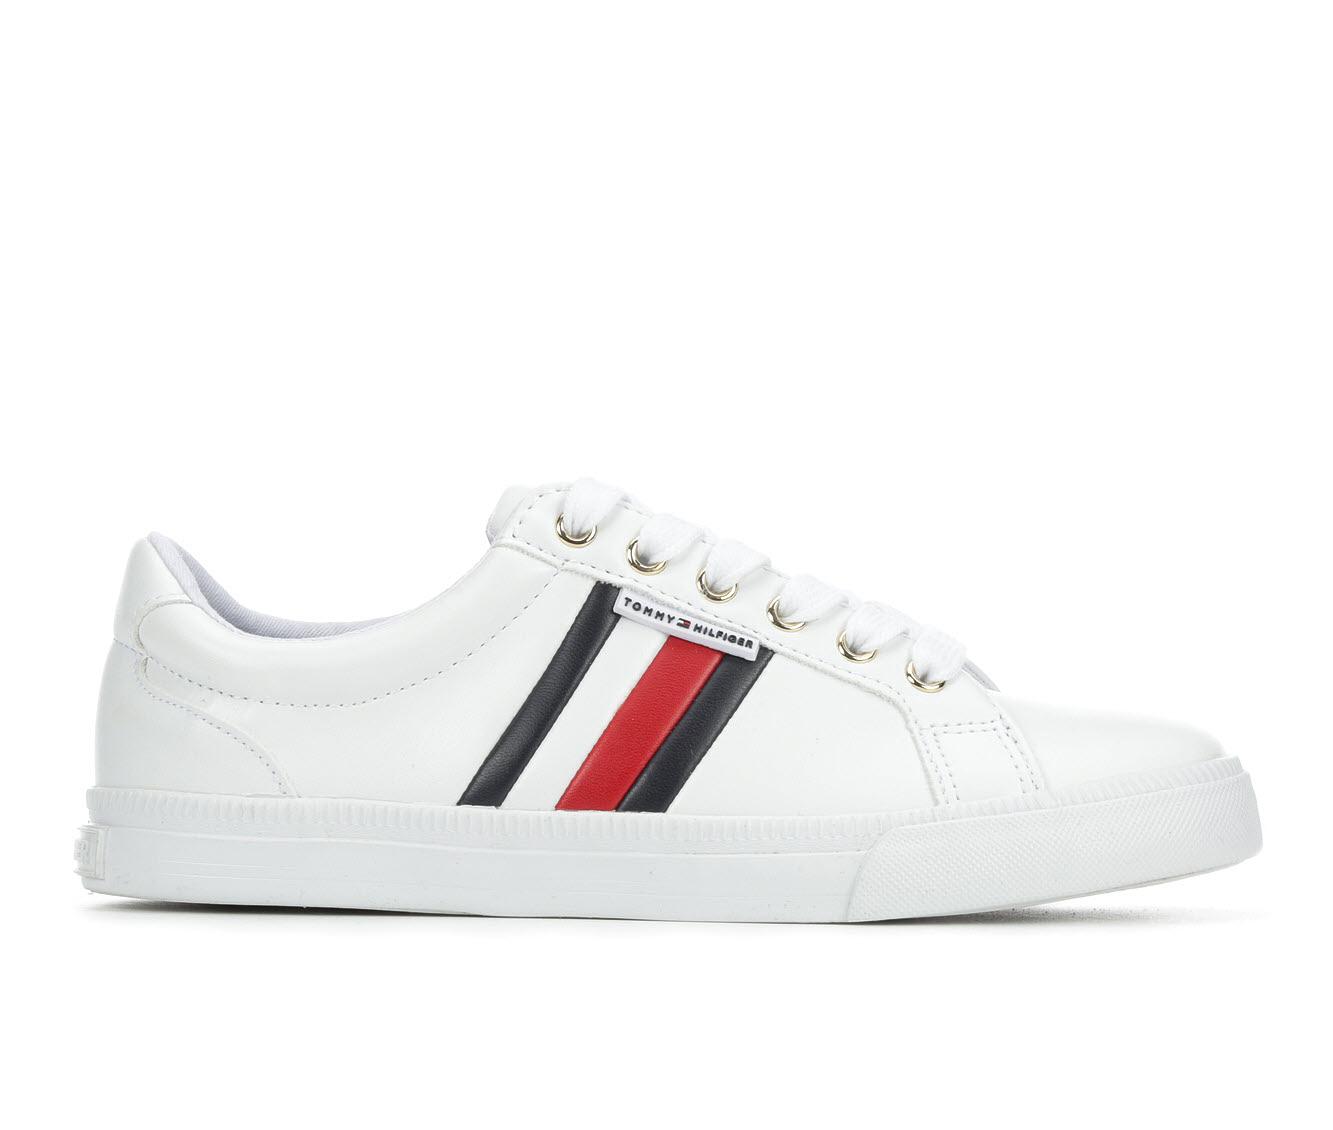 Tommy Hilfiger Lightz Women's Shoe (White Faux Leather)